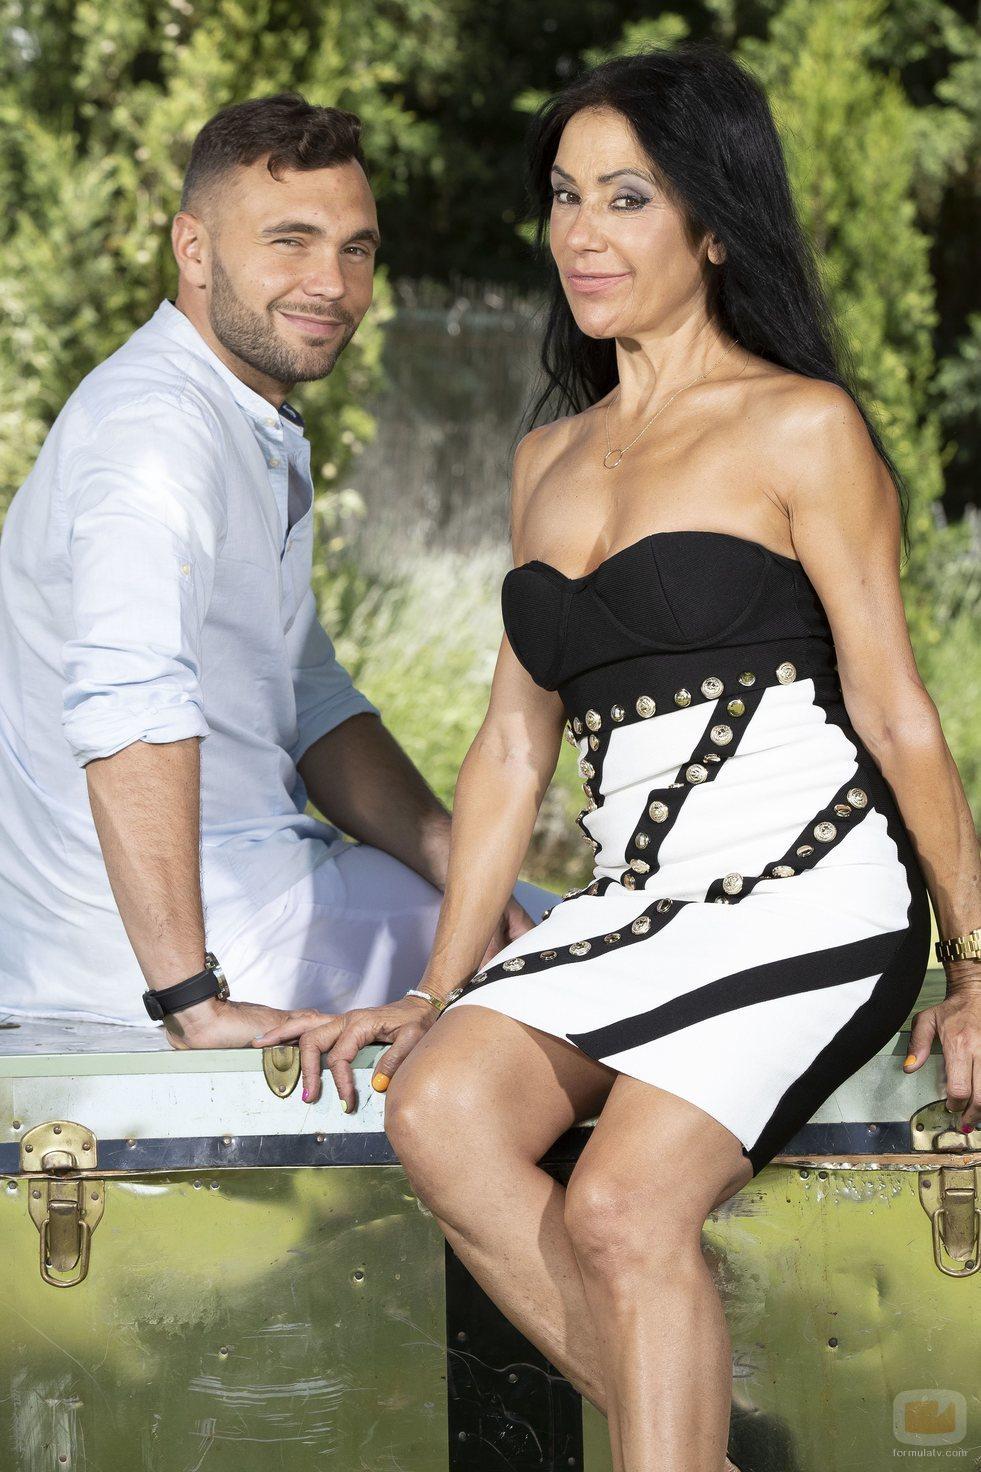 Maite Galdeano y Cristian Suescun, participantes de 'La casa fuerte'